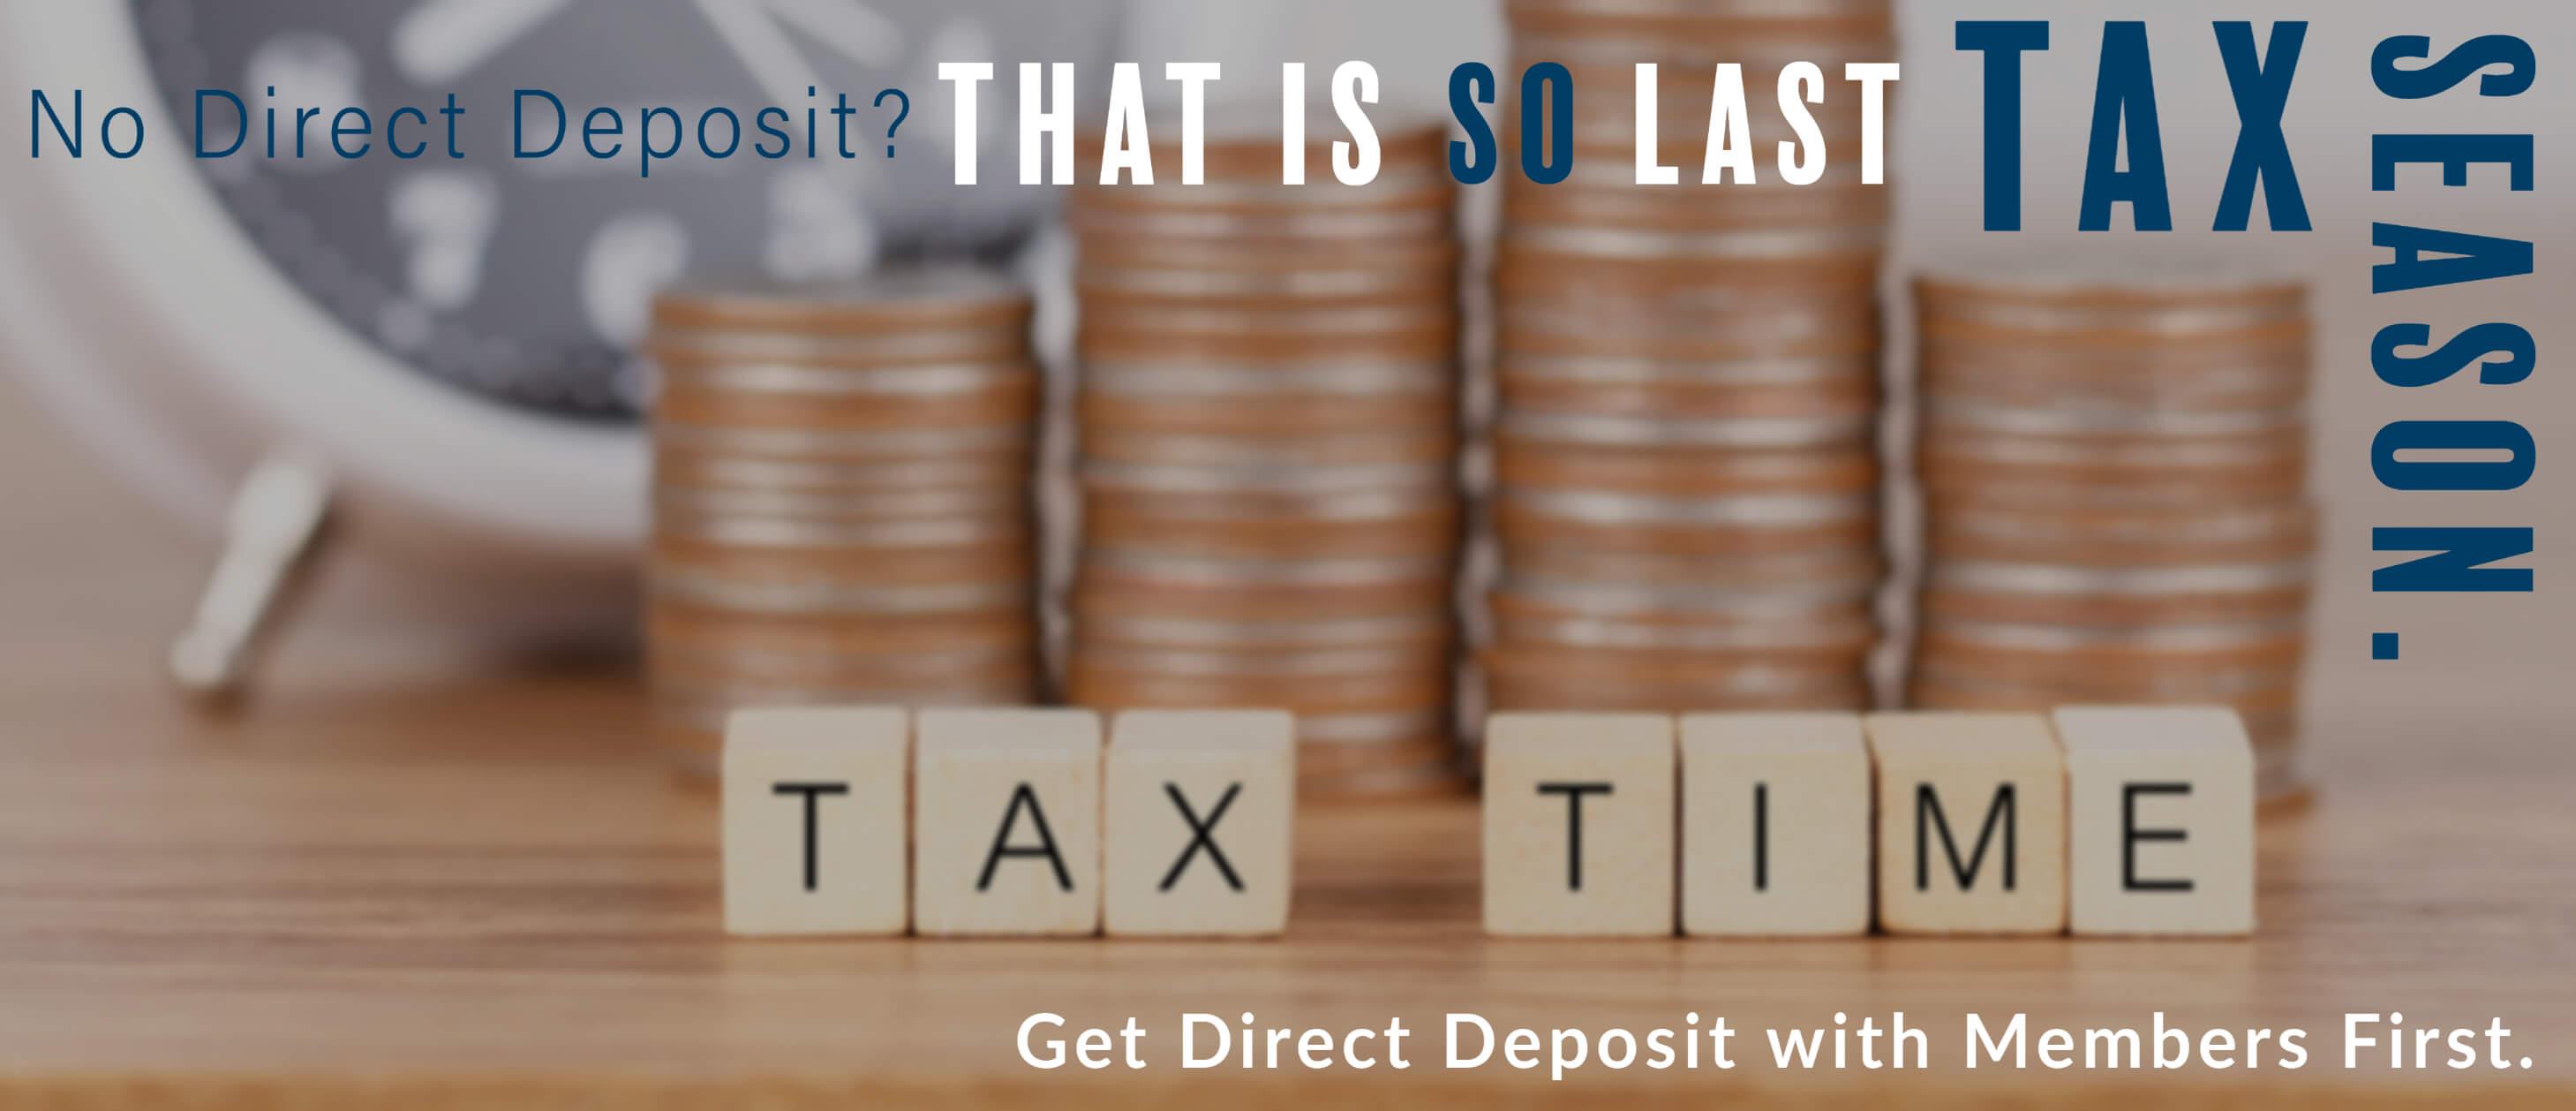 So Last Tax Season . Direct Deposit